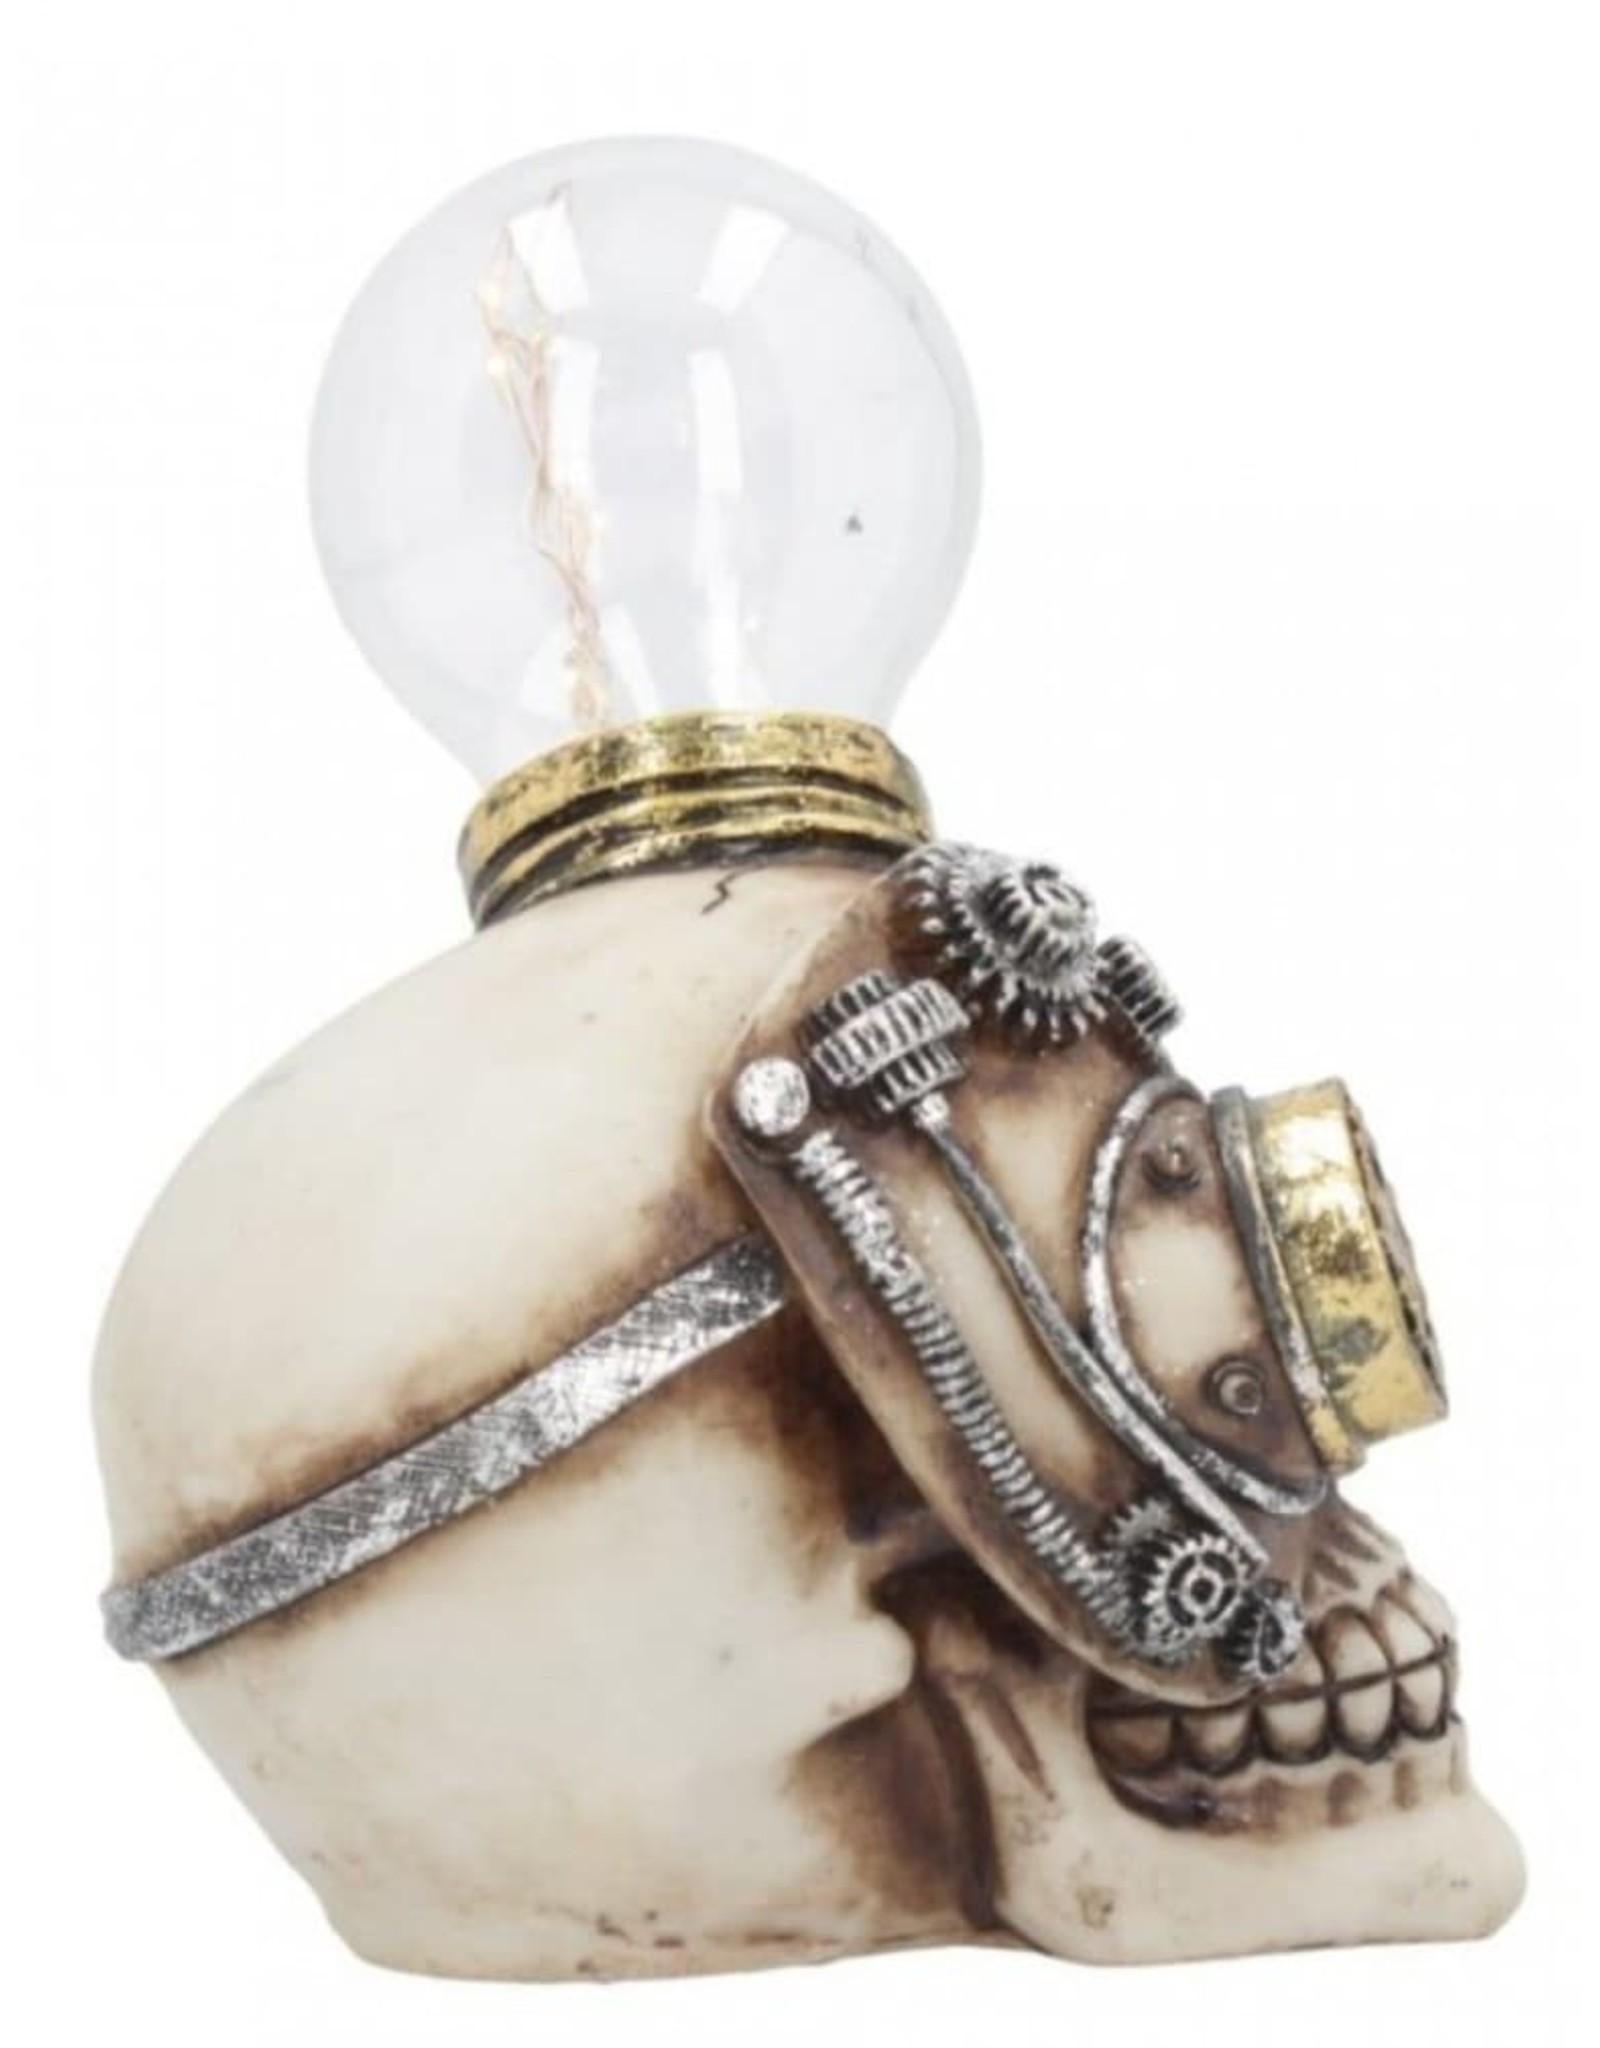 Alator Schedels - Steampunk Schedel met gloeilamp Light Minded - Nemesis Now